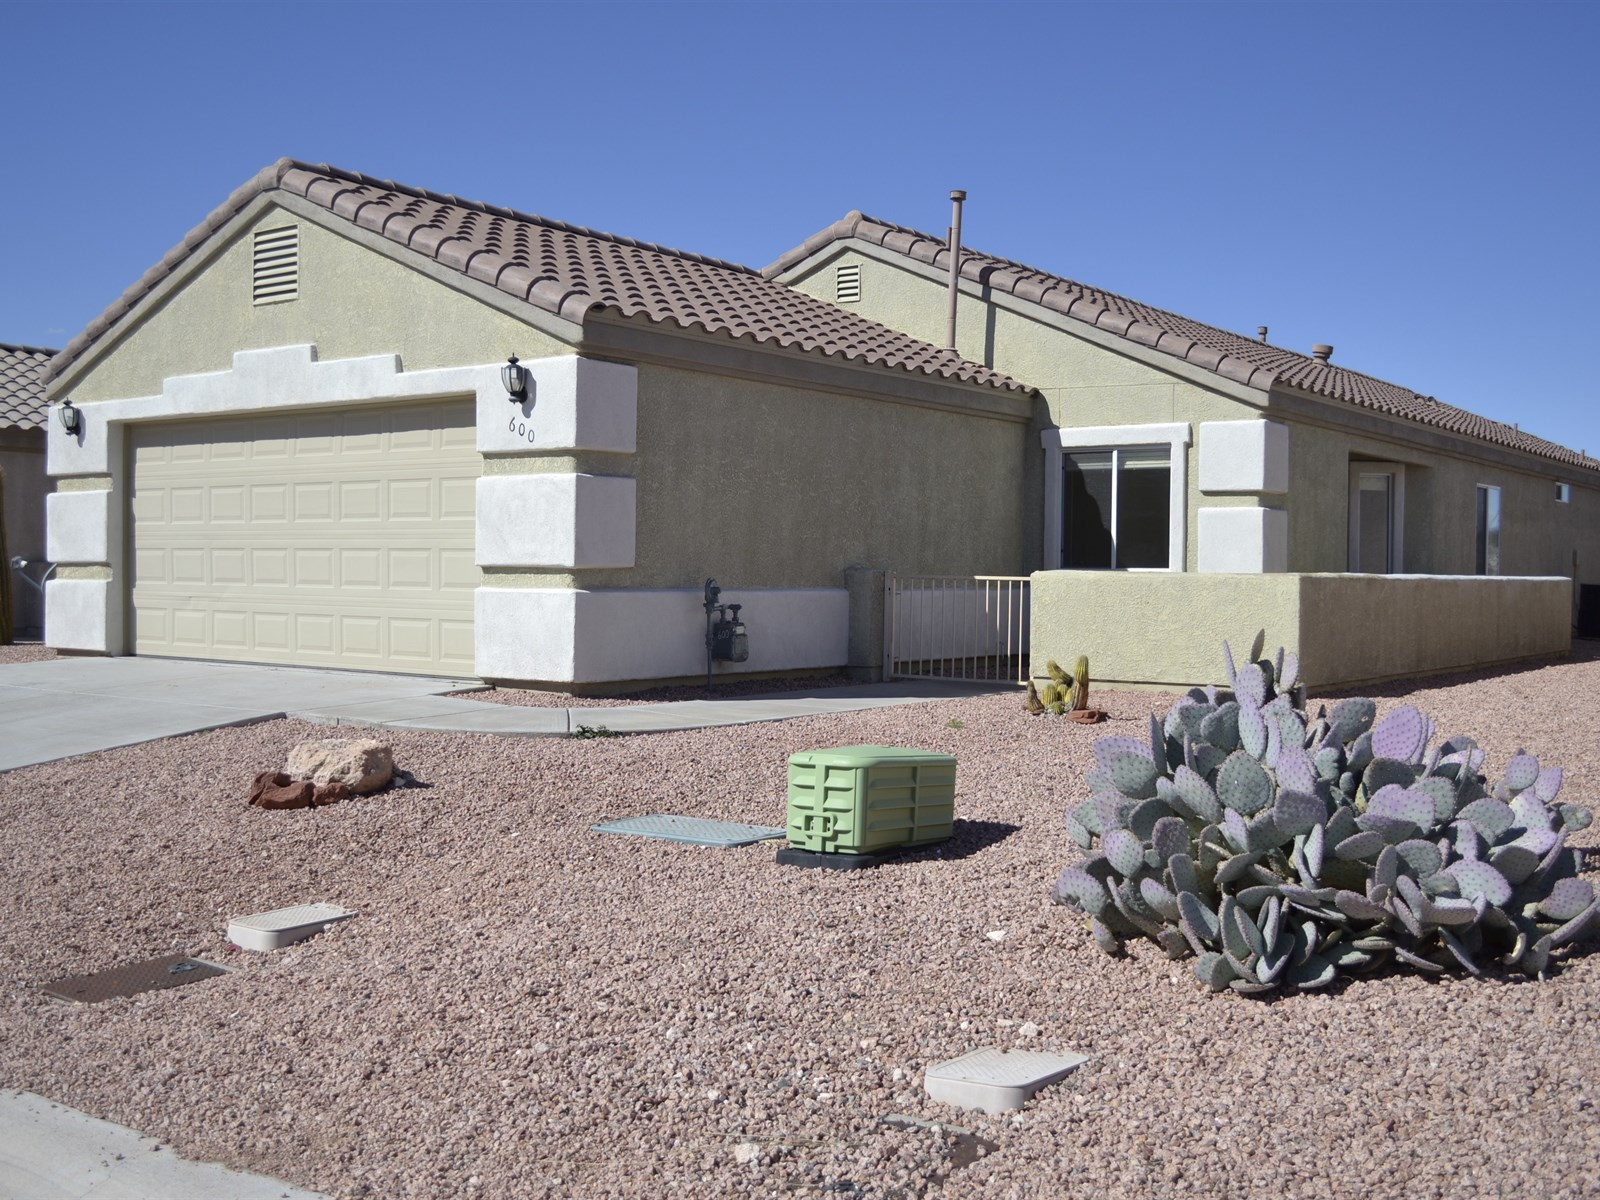 Single Family Home for Sale at Lovely Single Level Home 600 S La Mirada 600 S La Mirada Cornville, Arizona 86325 United States